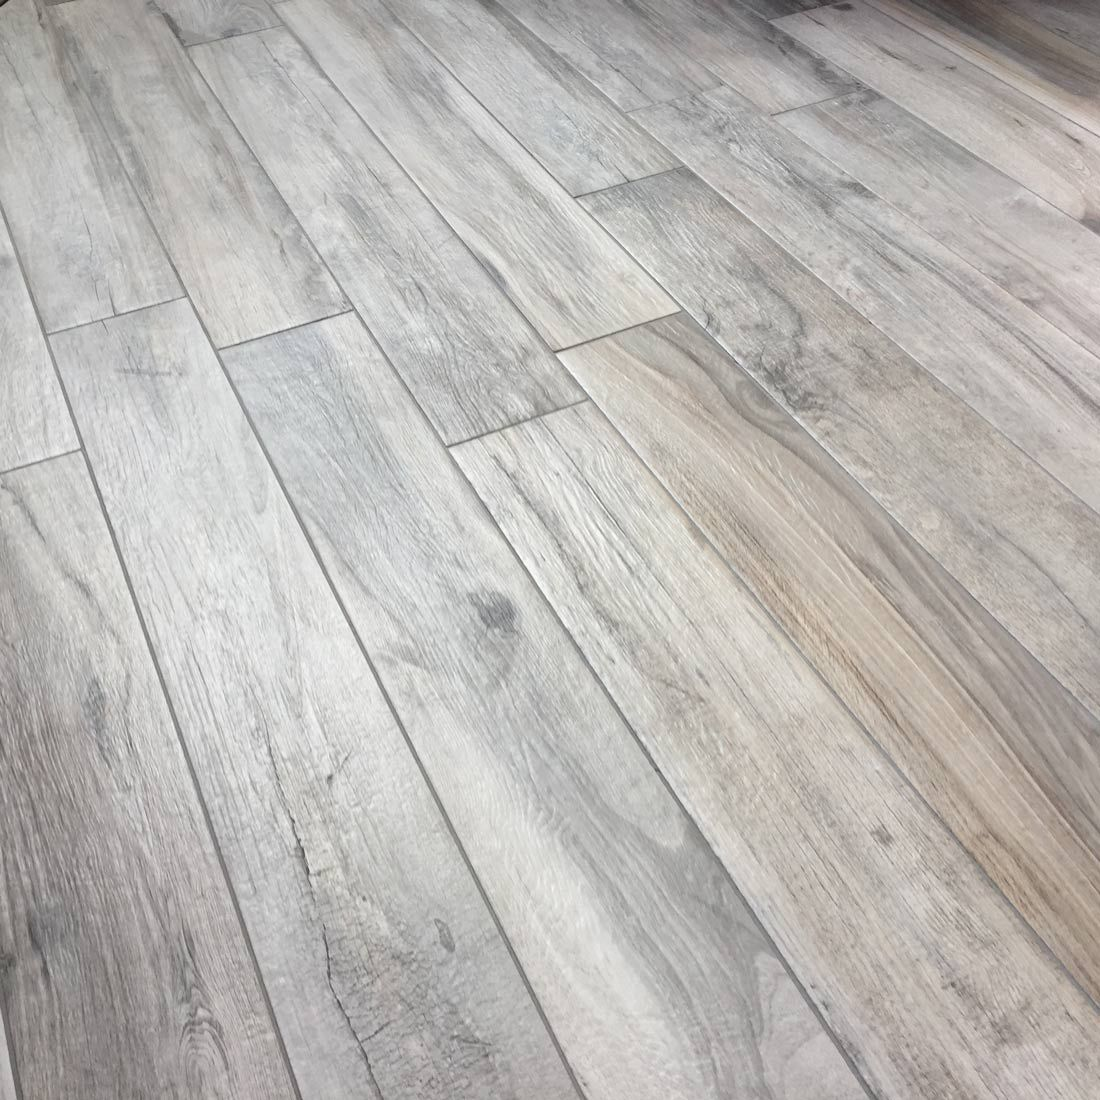 15x100cm Soft Greige Wood Tile By Rondine Ceramic Wood Tile Floor Wood Tile Wood Effect Tiles